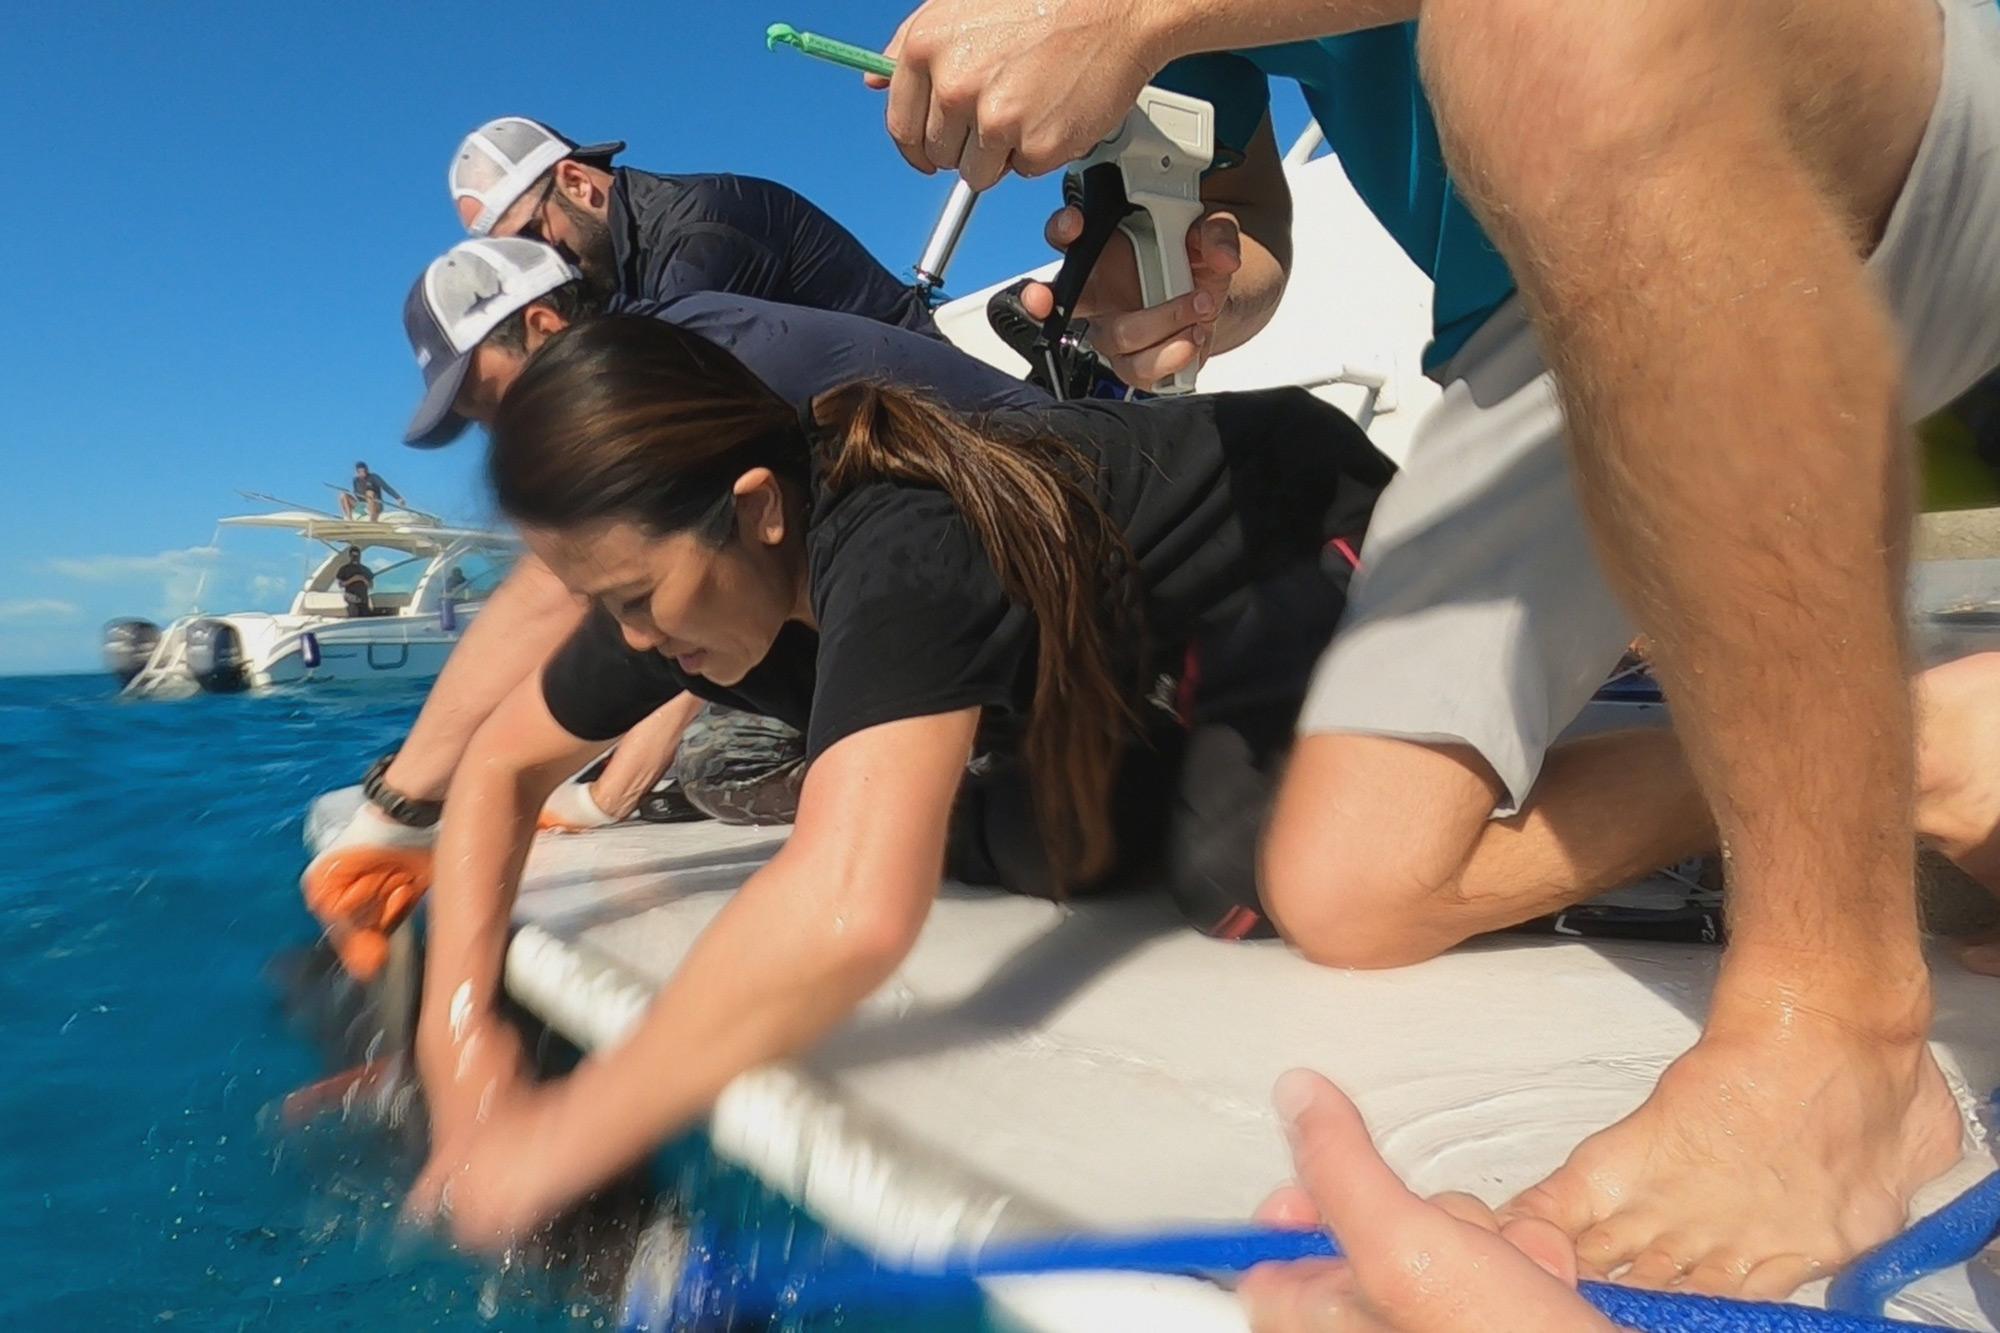 Shark Week 2021 DR. PIMPLE POPPER POPS SHARK WEEK